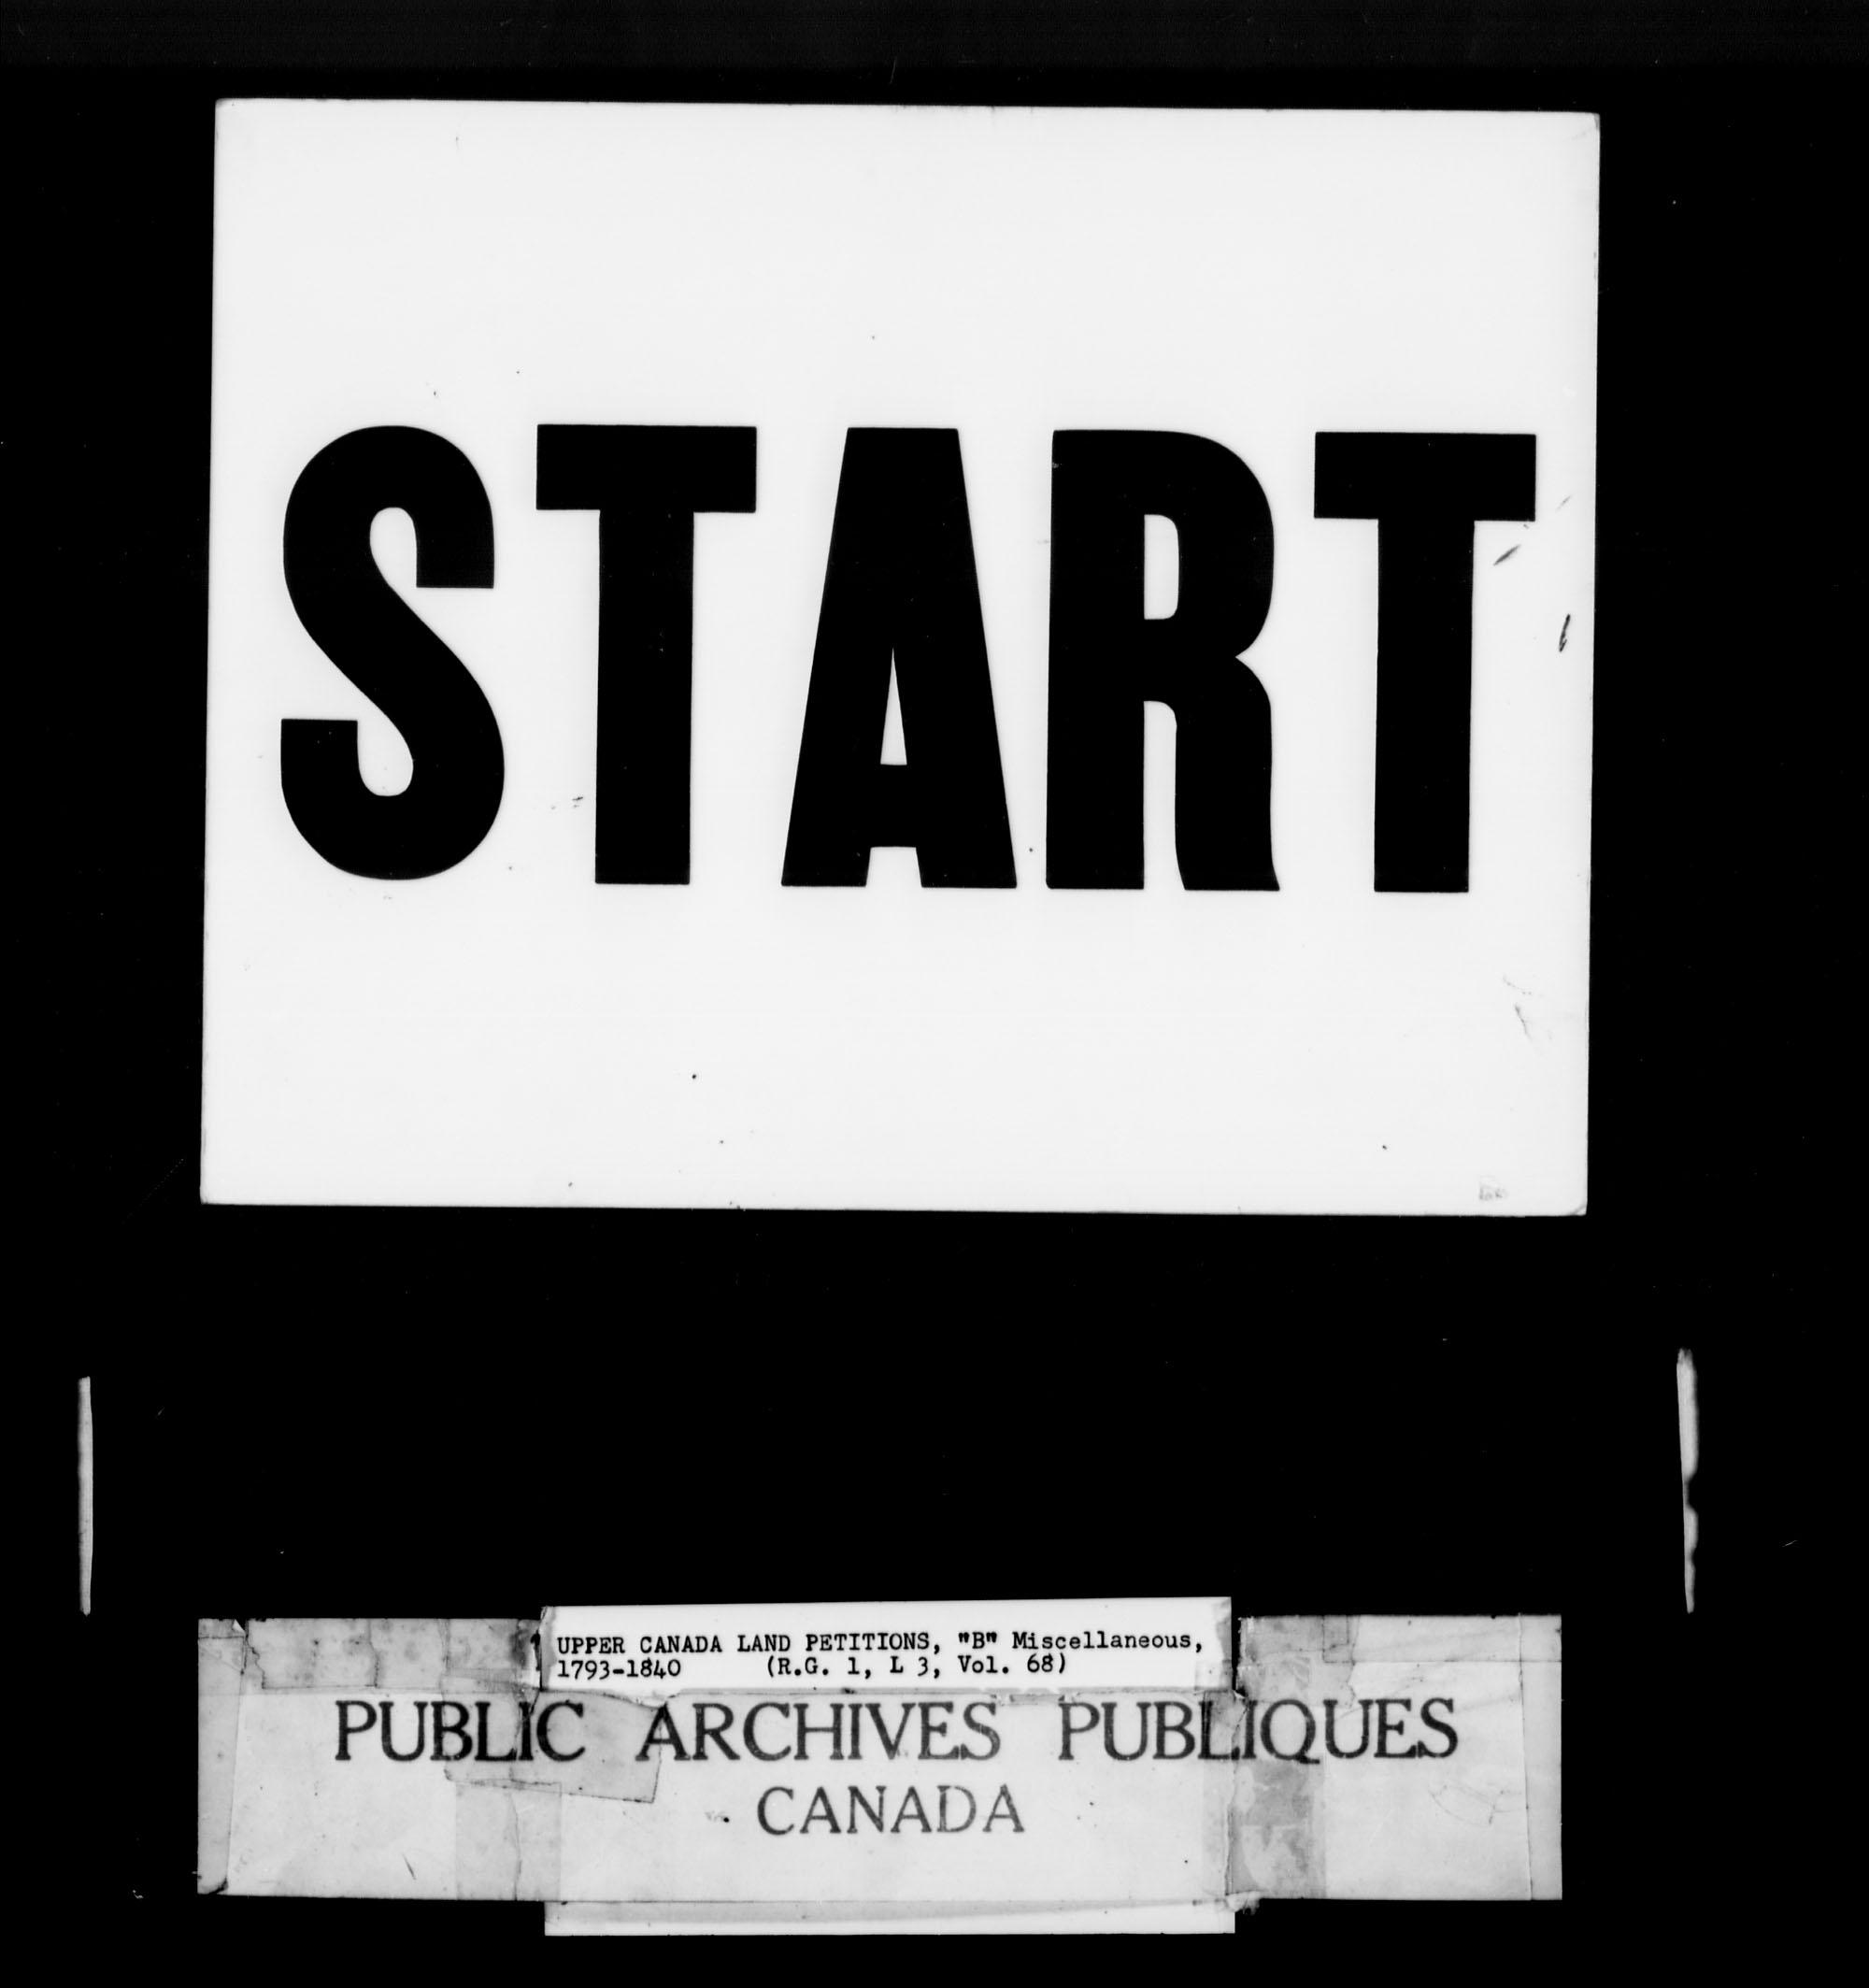 Titre: Demandes de terres du Haut-Canada (1763-1865) - N° d'enregistrement Mikan: 205131 - Microforme: c-1636